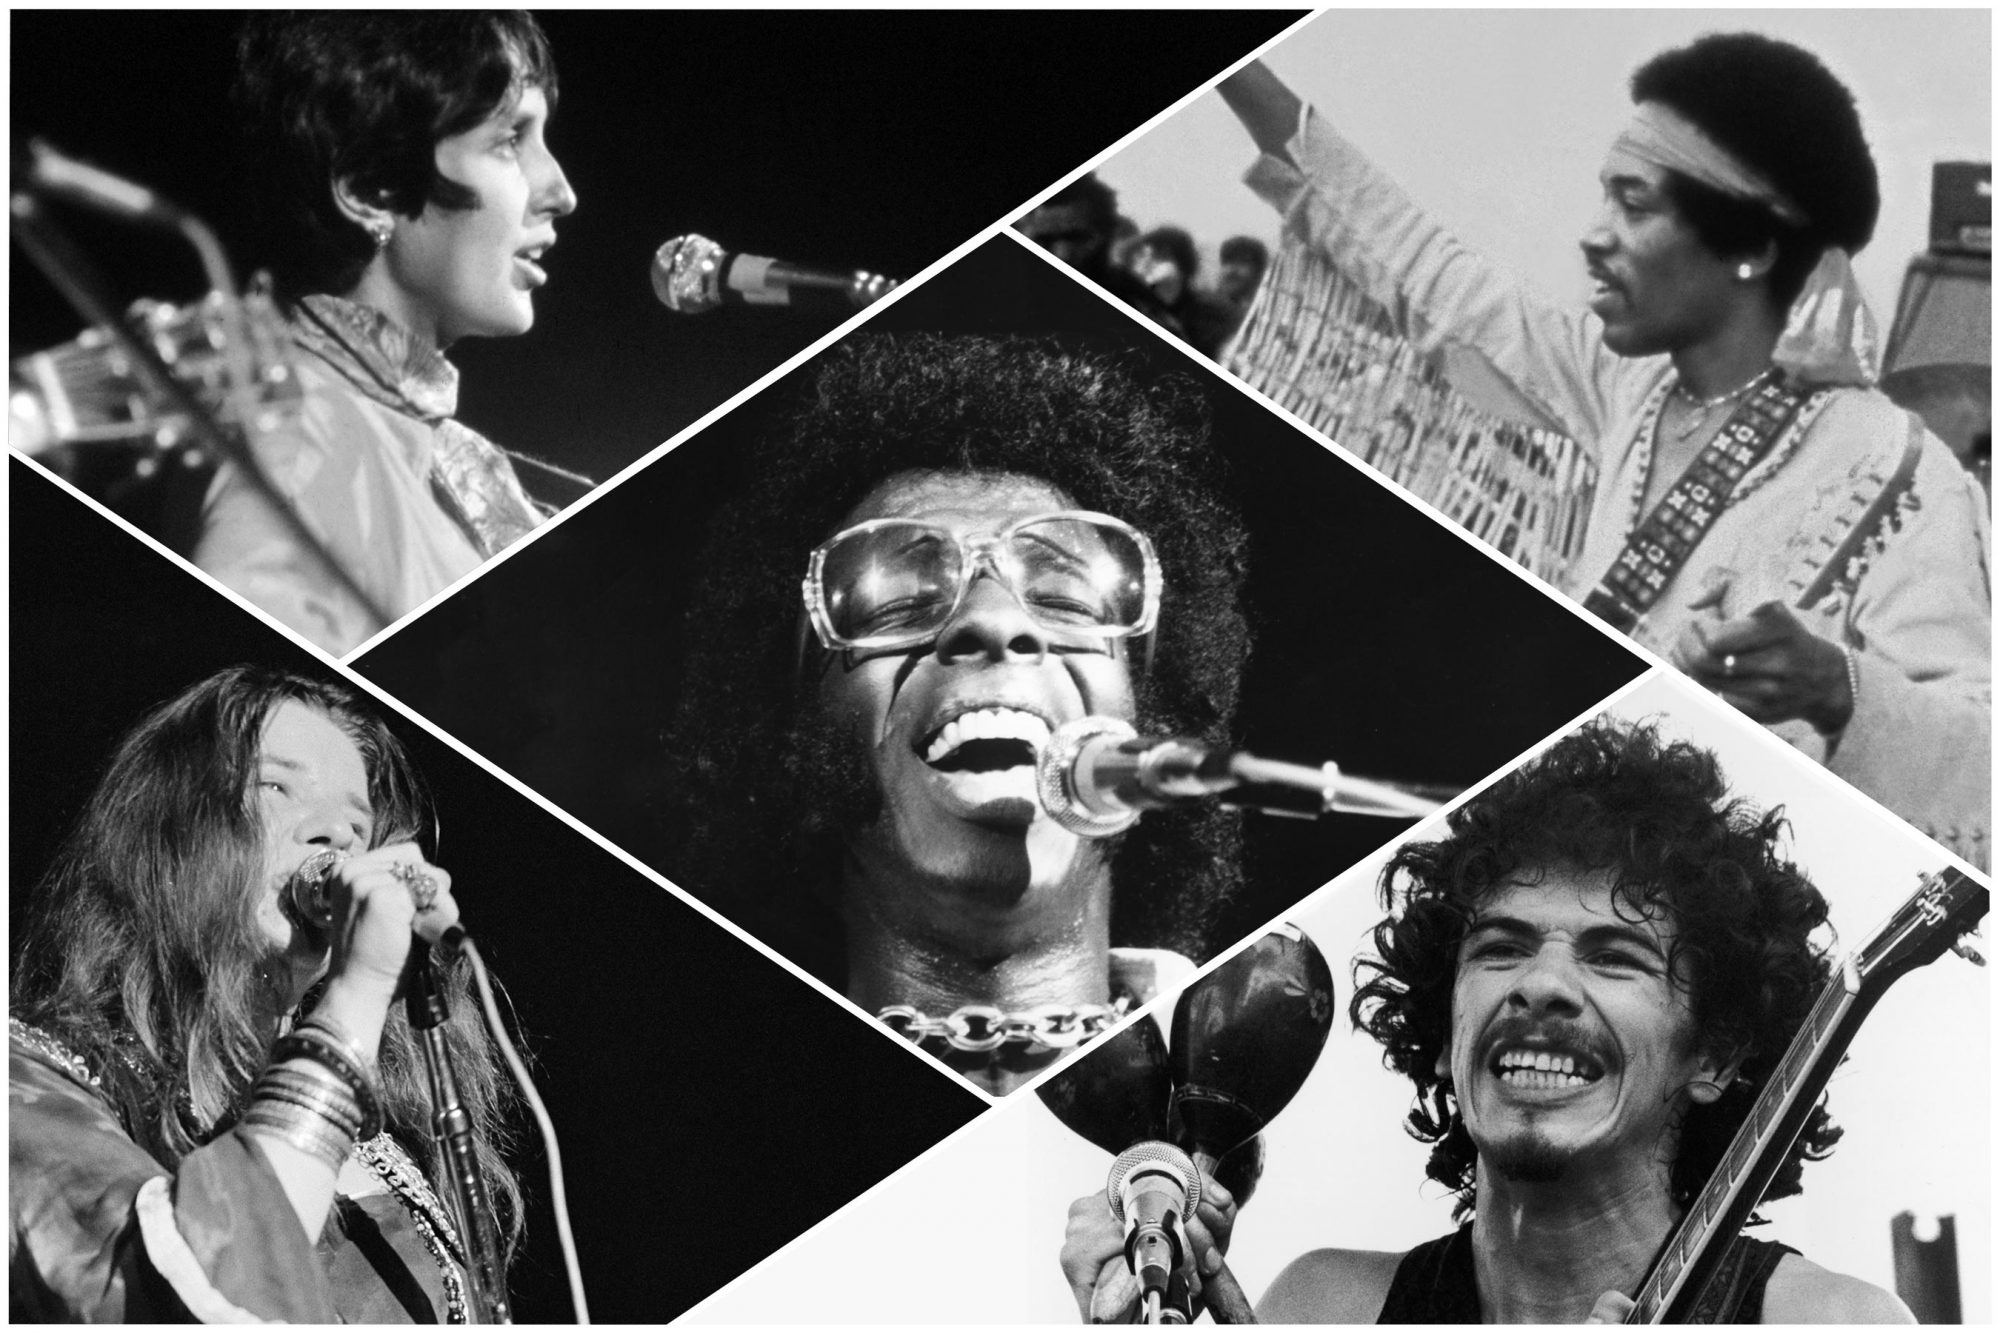 Joan Baez, Family Stone, Jimi Hendrix, Carlos Santana, Janis Joplin